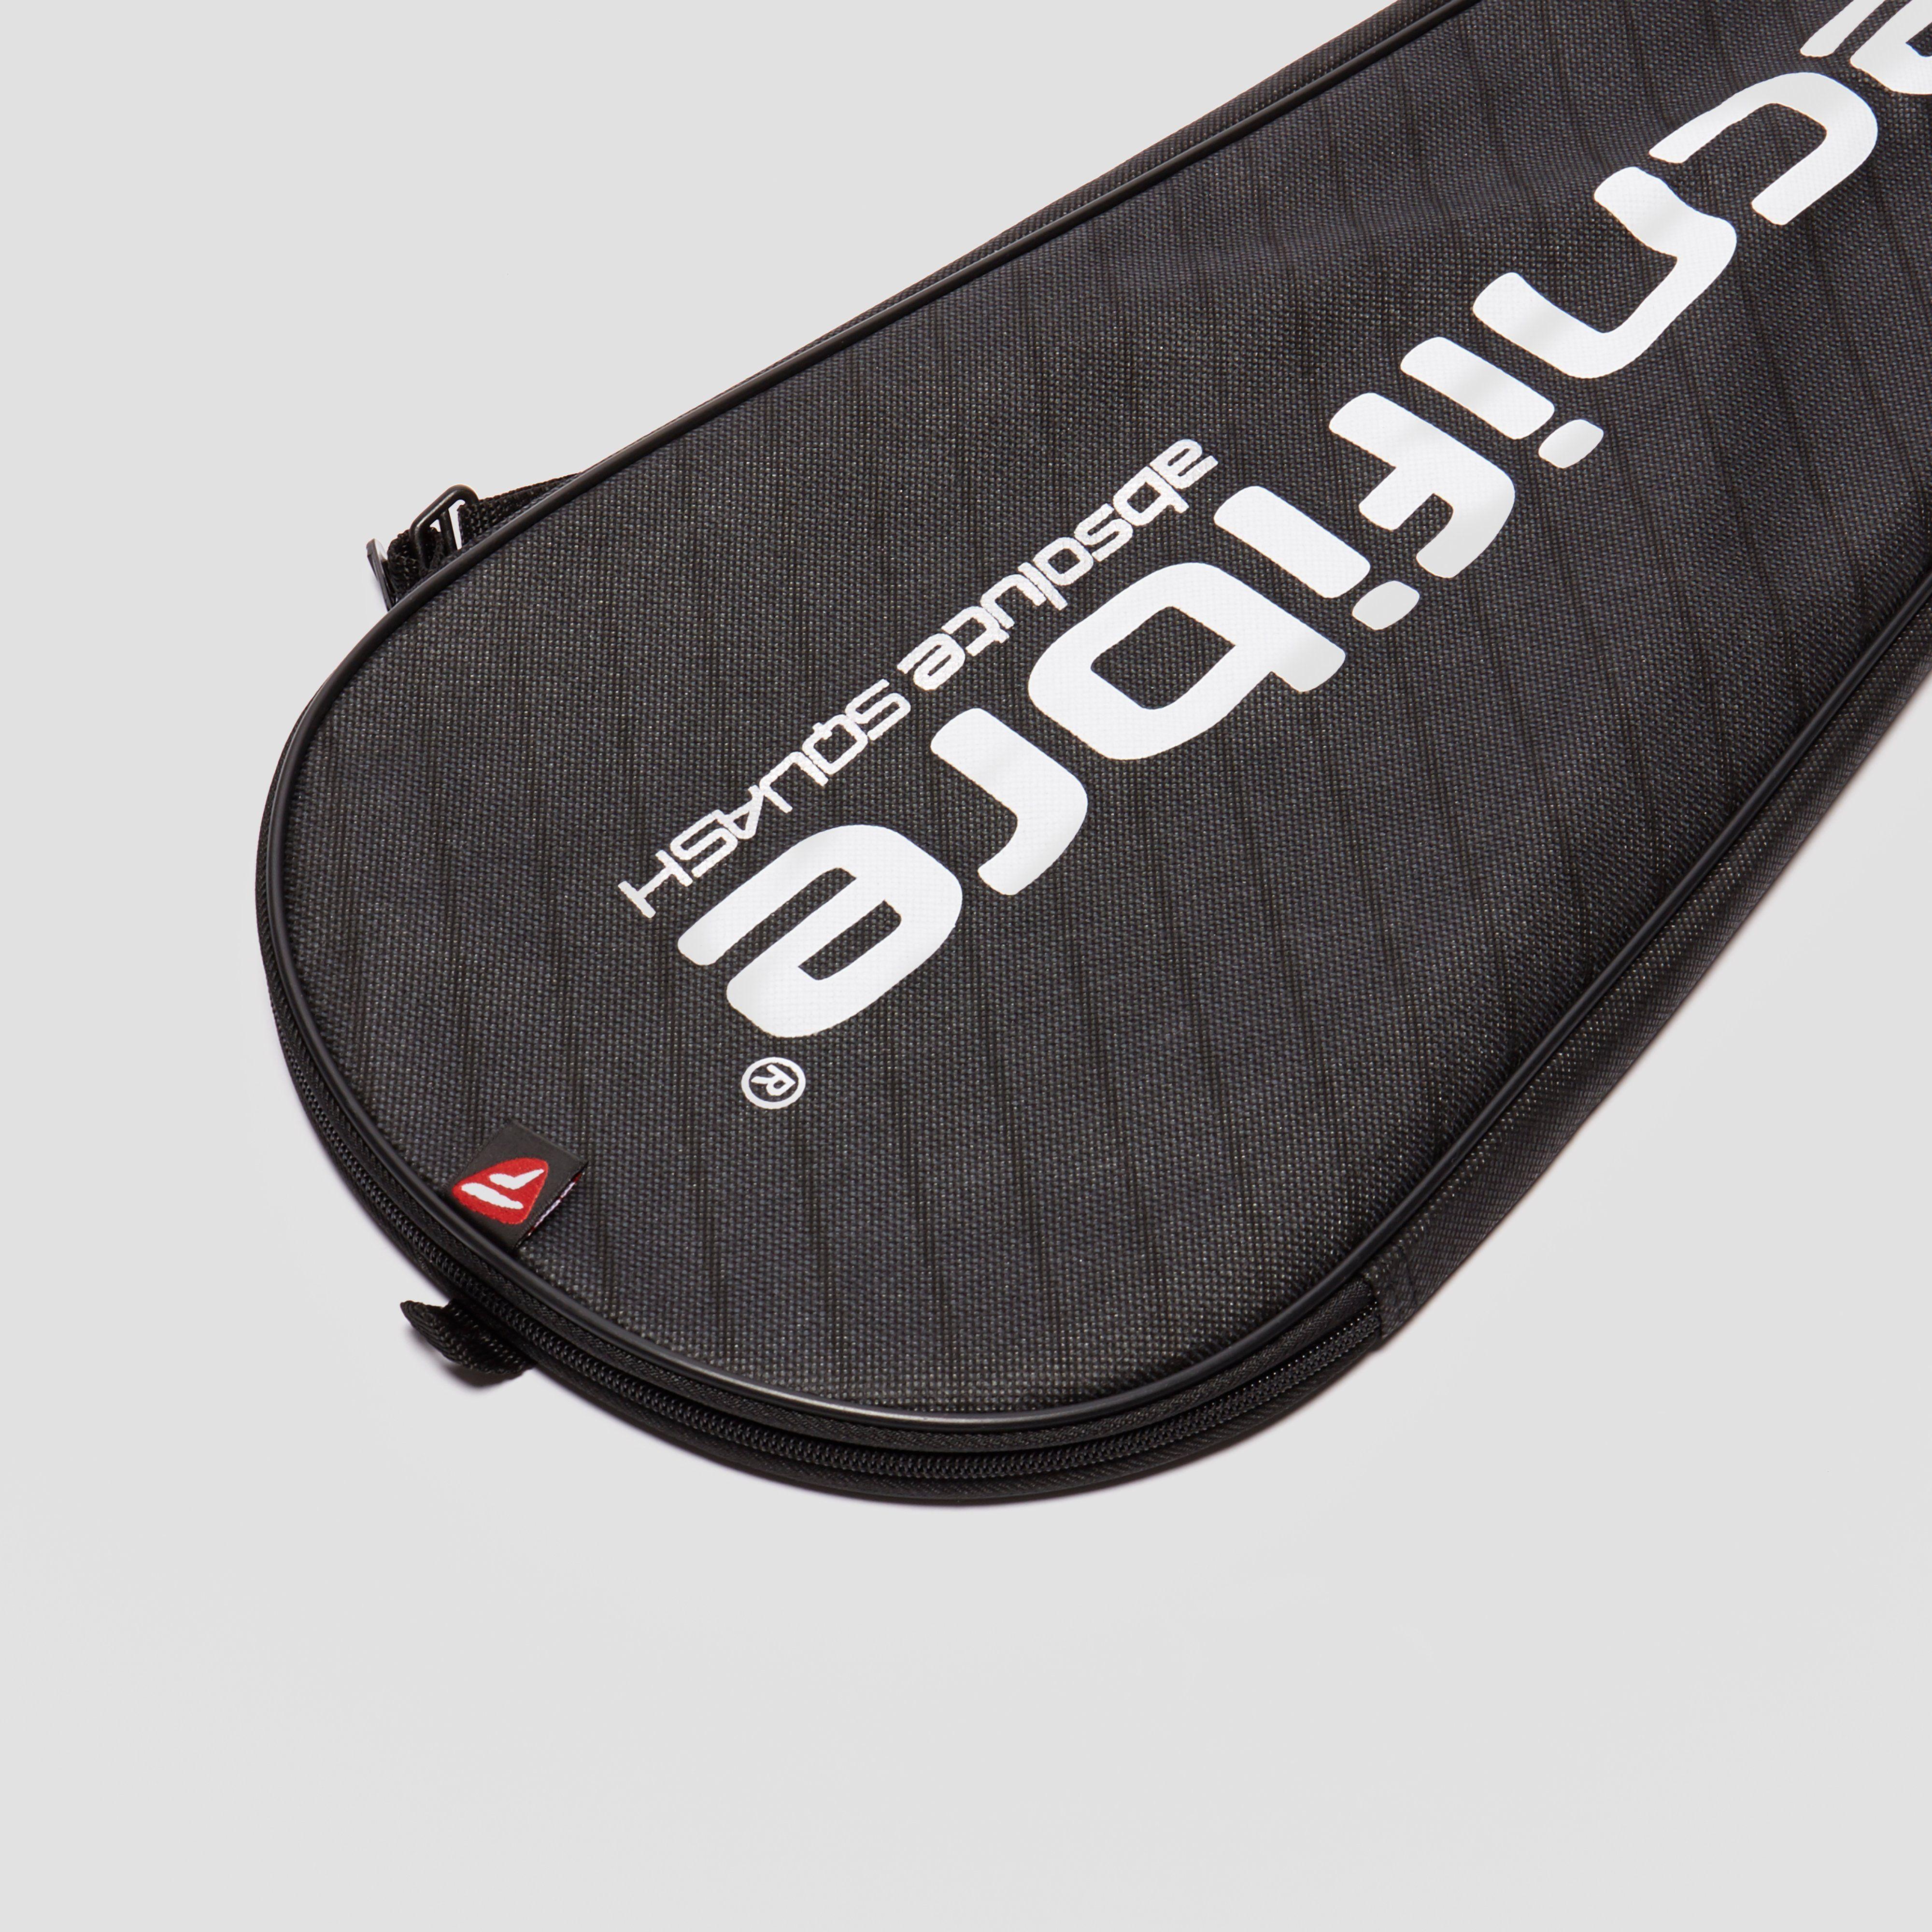 Tecnifibre Carboflex 135S Squash Racket